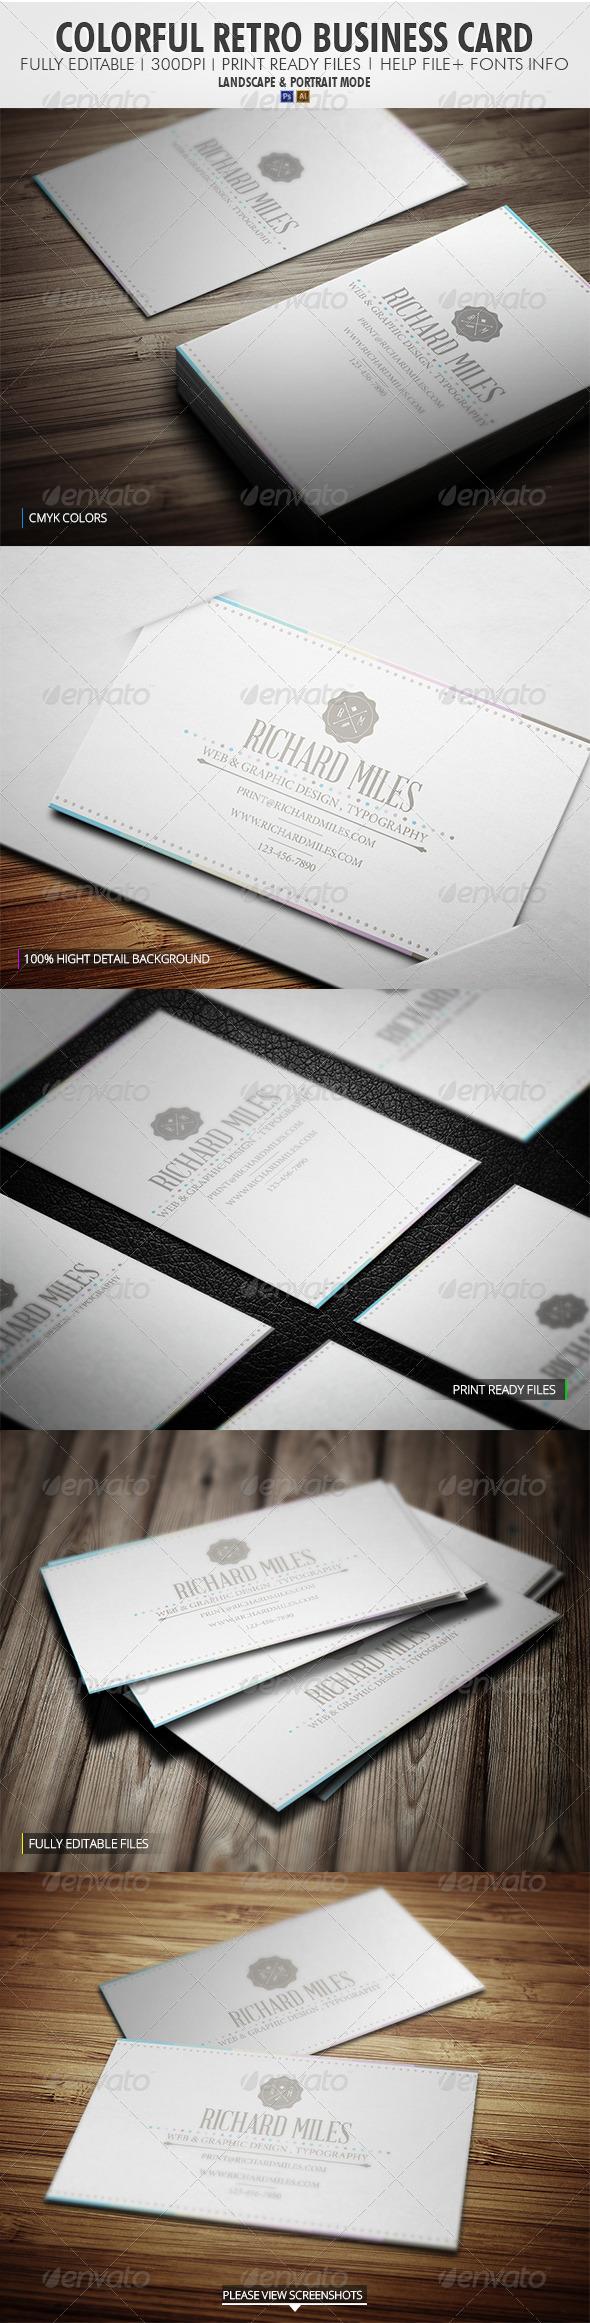 GraphicRiver Colorful Retro Business Card 4100100